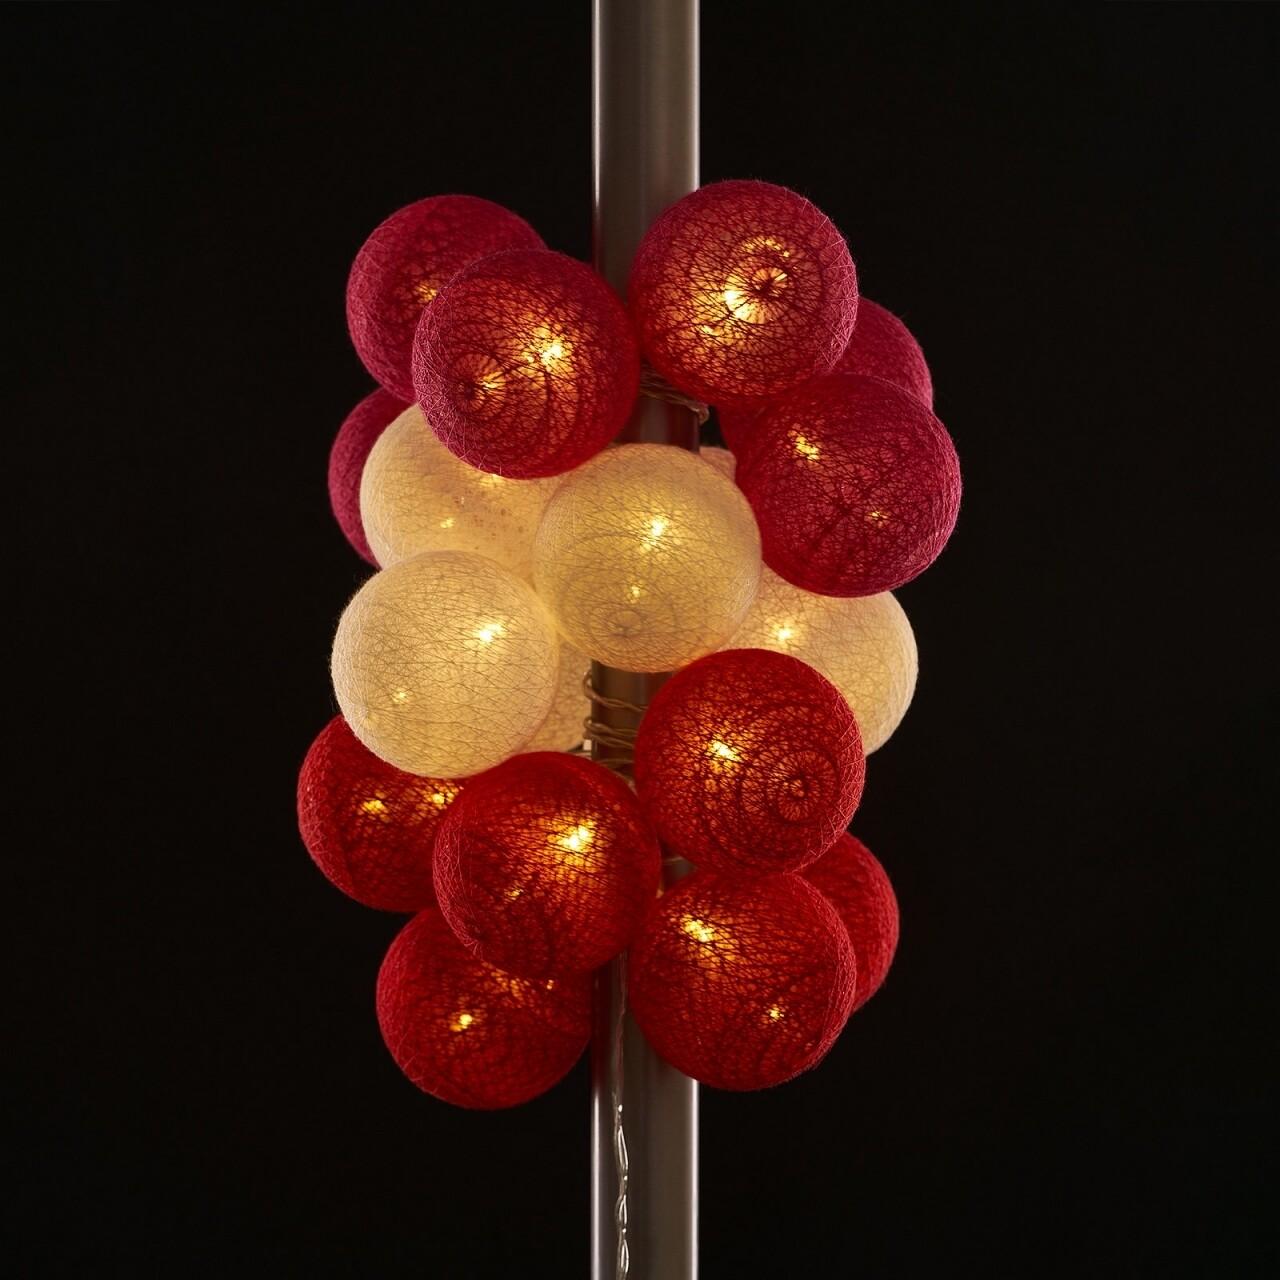 Ghirlanda luminoasa cu 20 LED-uri Red, Heinner Home, 330 cm, plastic, alb/rosu